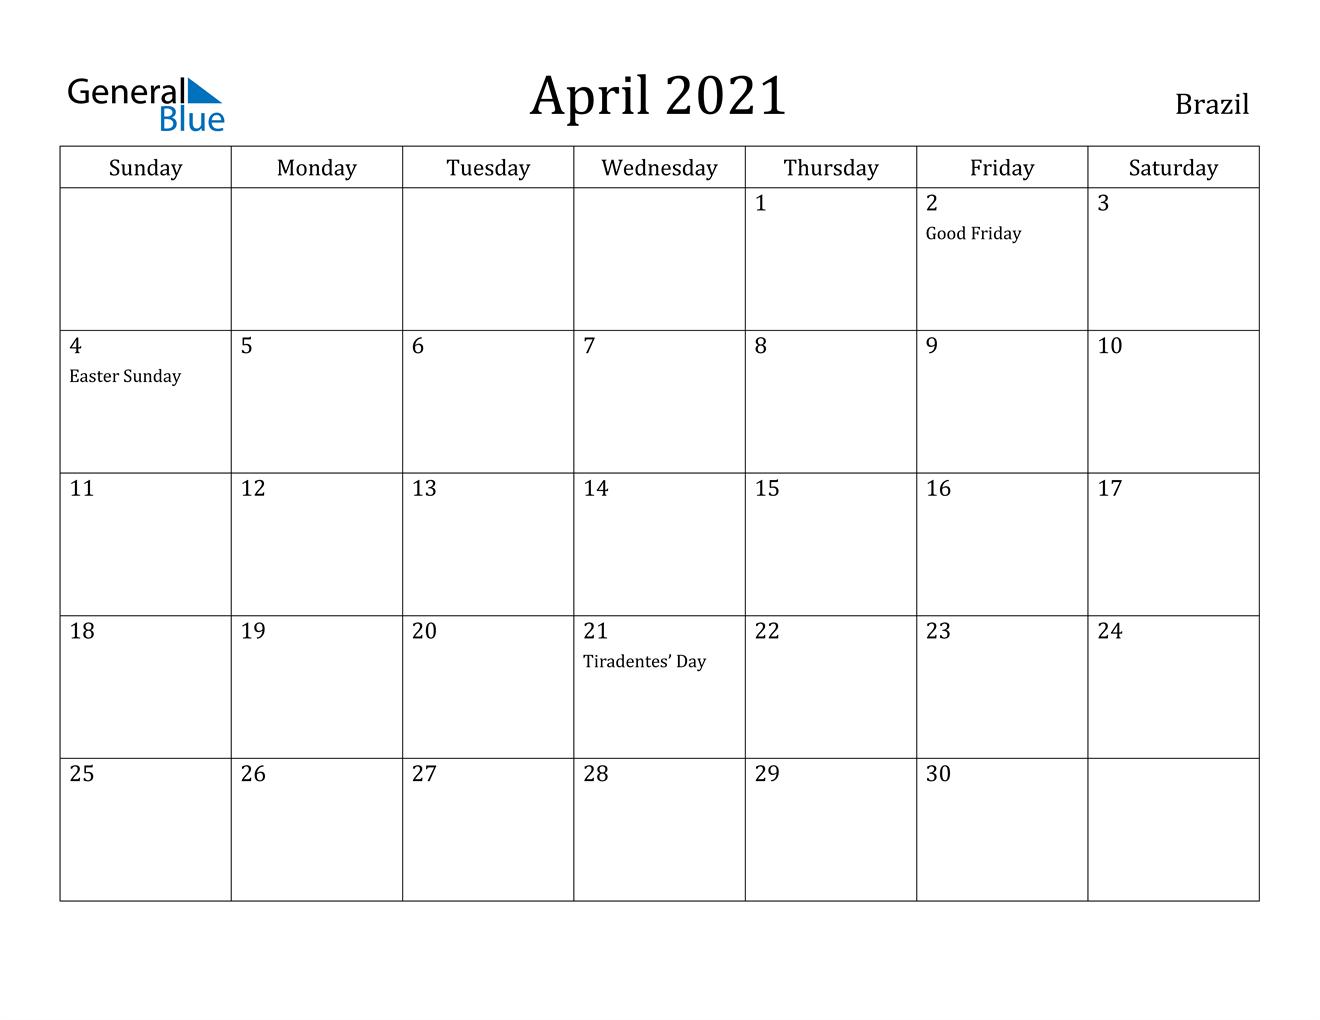 April 2021 Calendar - Brazil